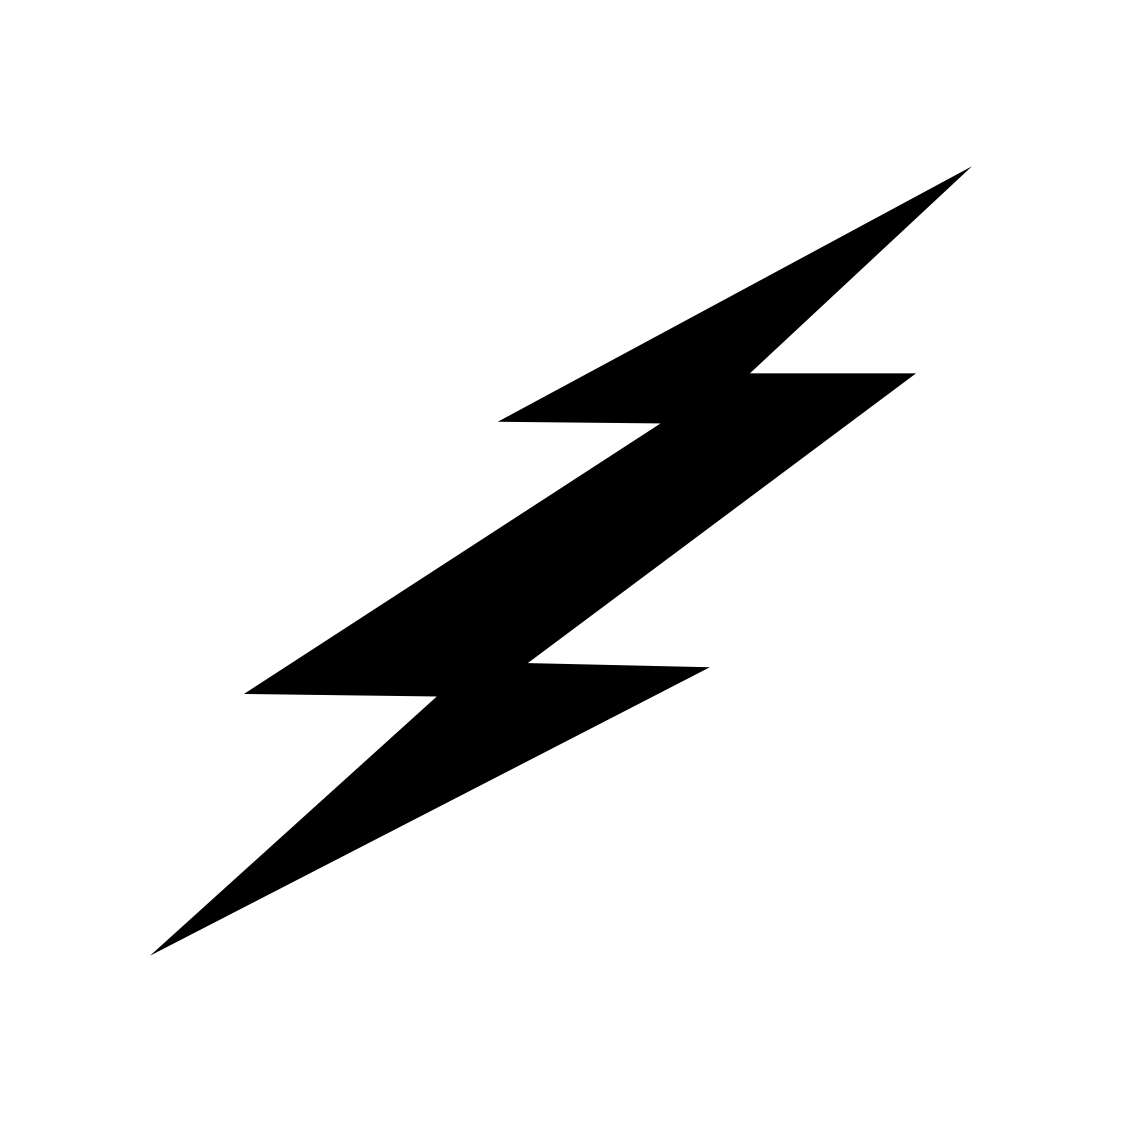 1122x1122 Black Lightning Bolt Clipart